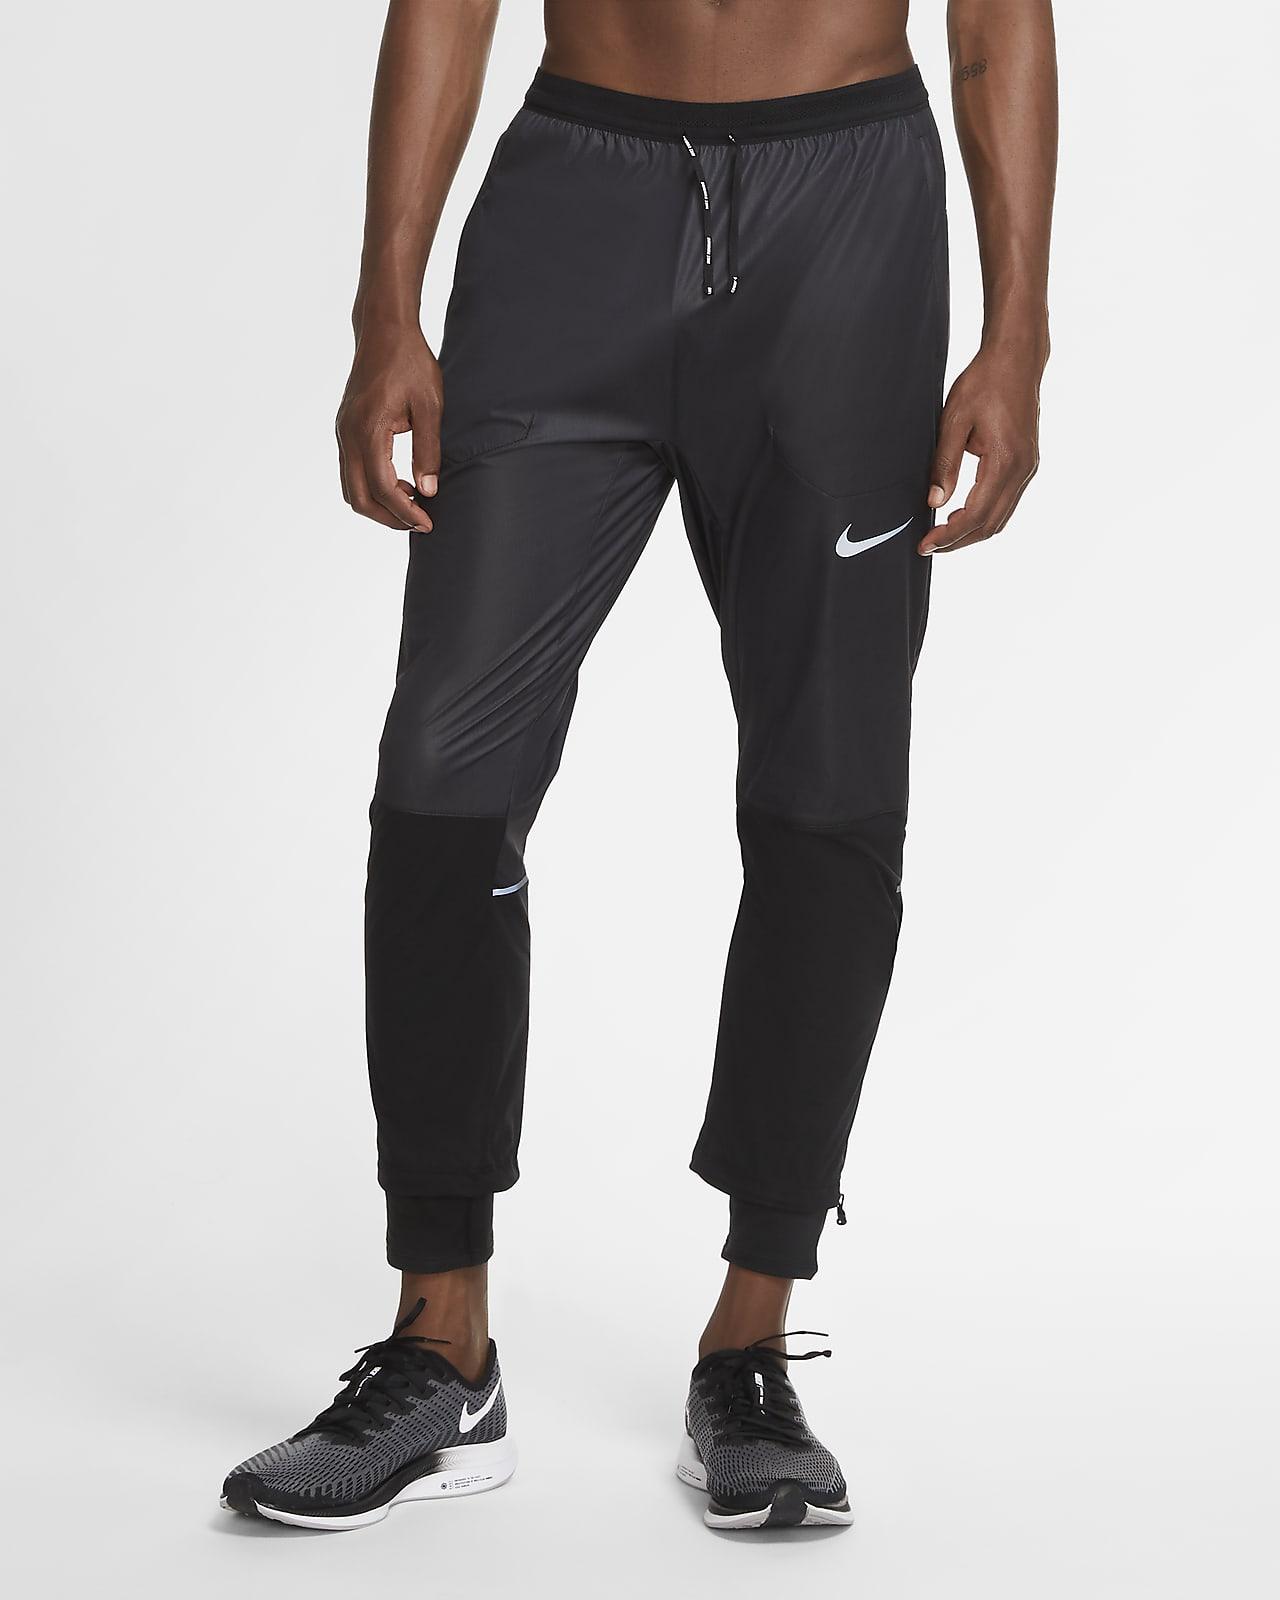 Pantalon de running Nike Swift Shield pour Homme